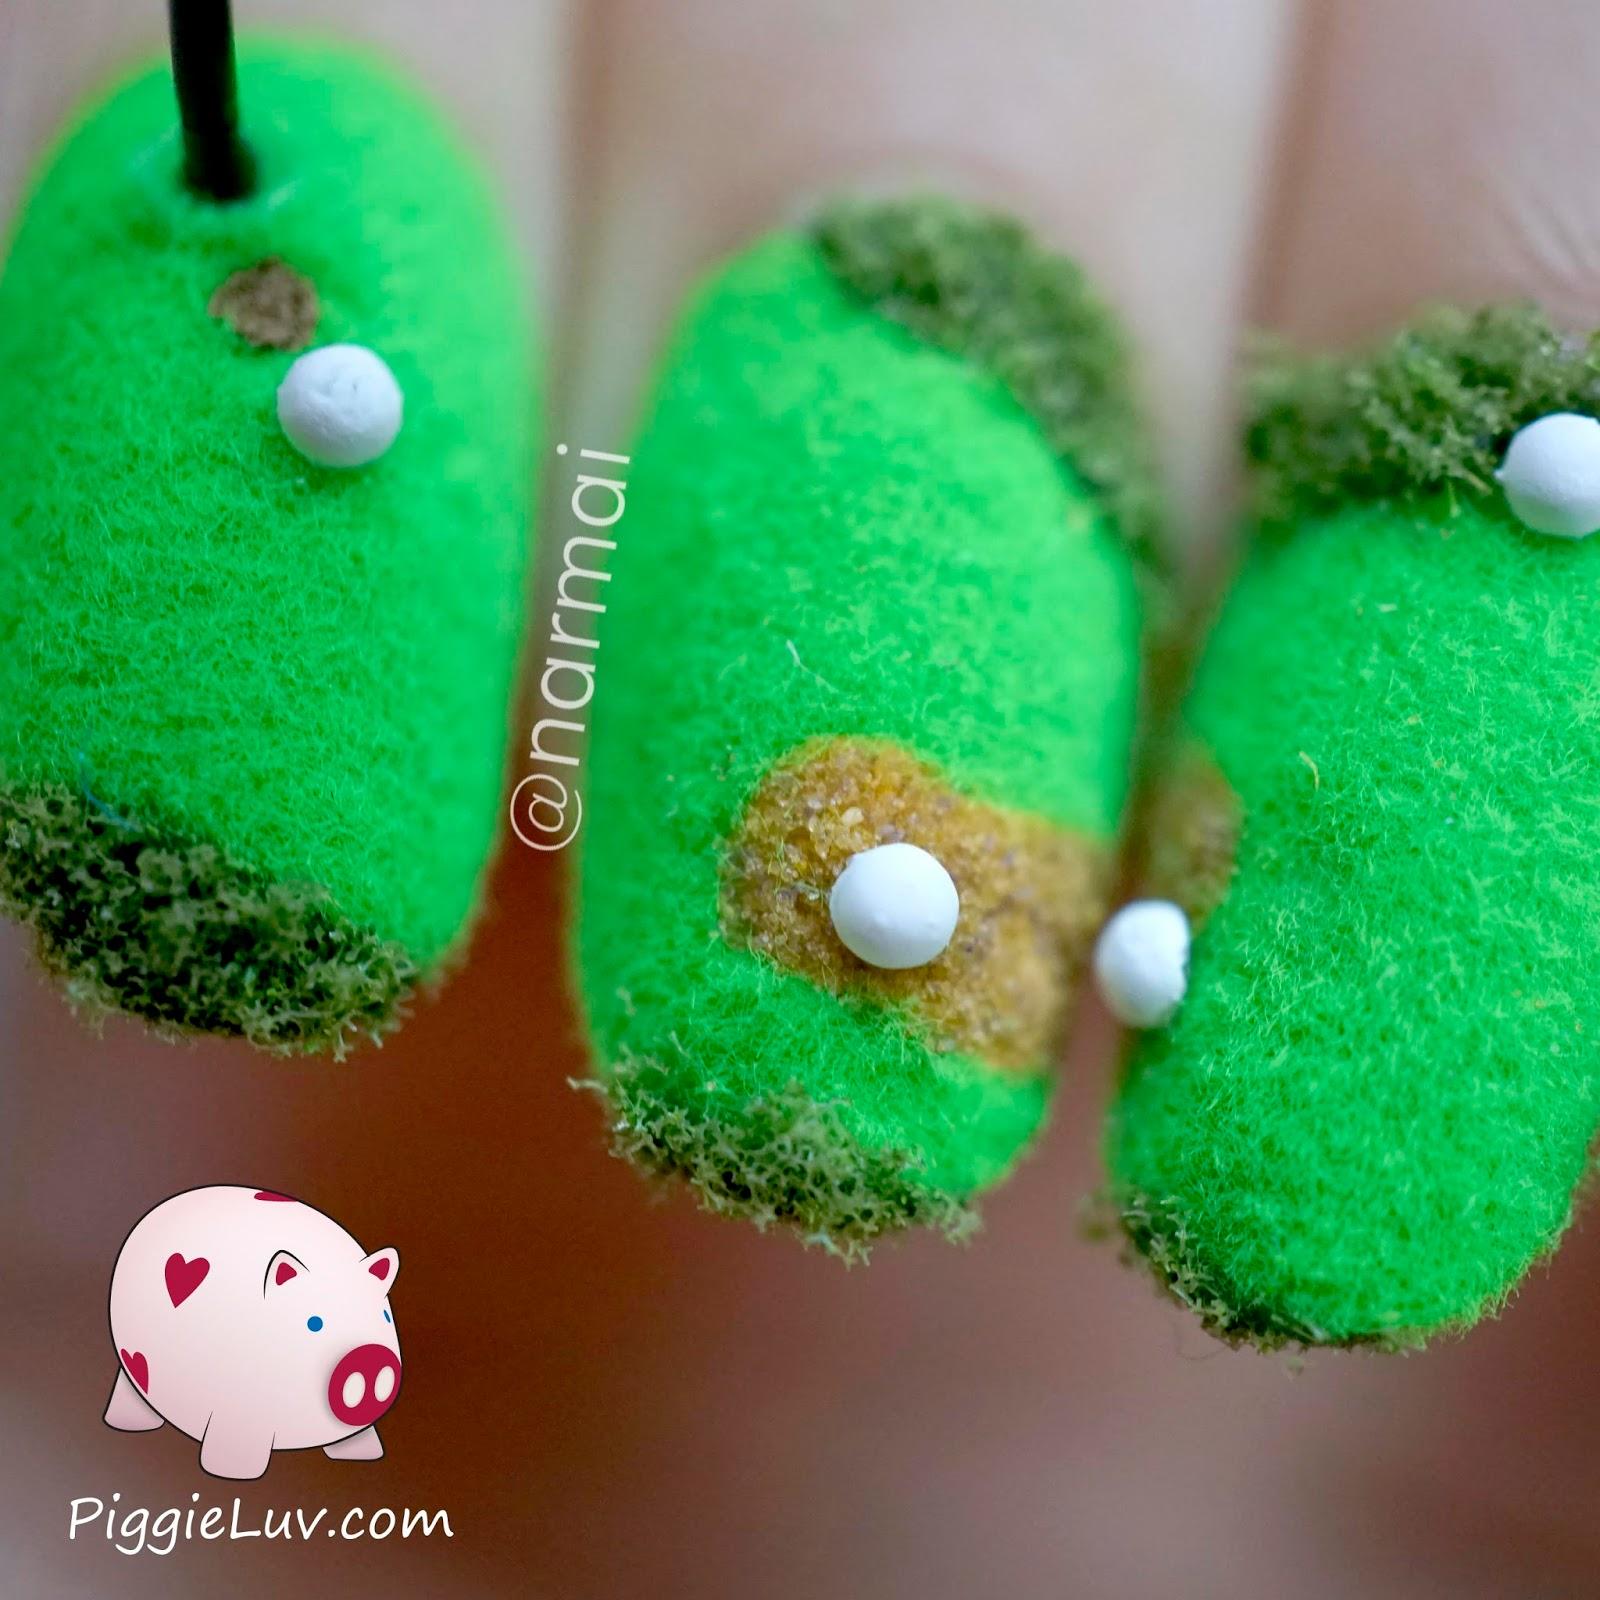 Piggieluv Fun 3d Golf Course Nail Art